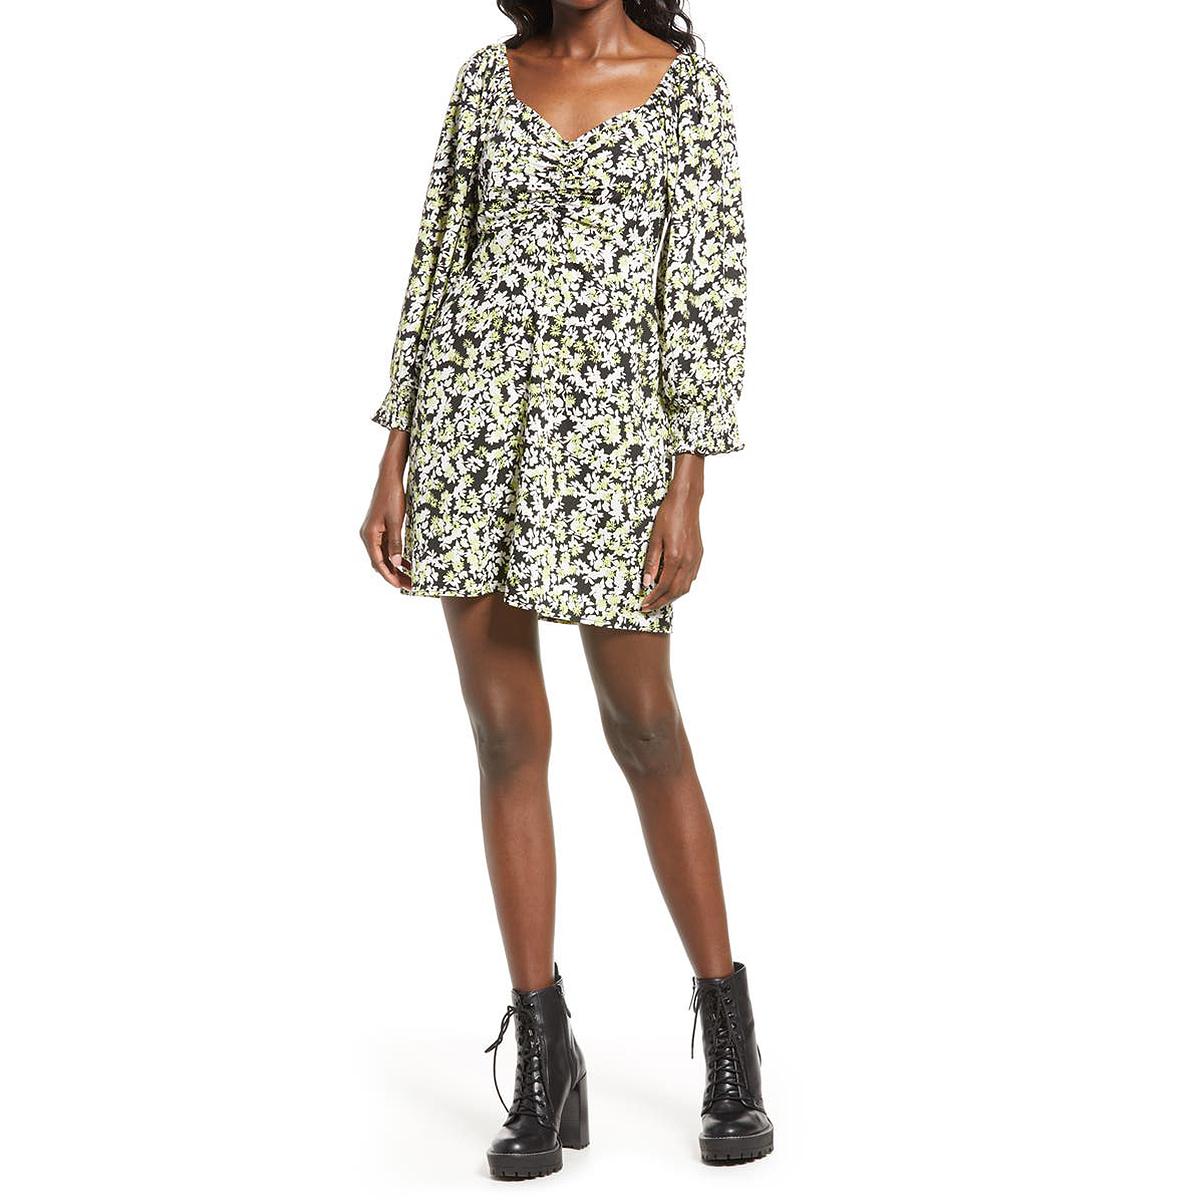 nordstrom-anniversary-sale-zara-style-vero-moda-dress